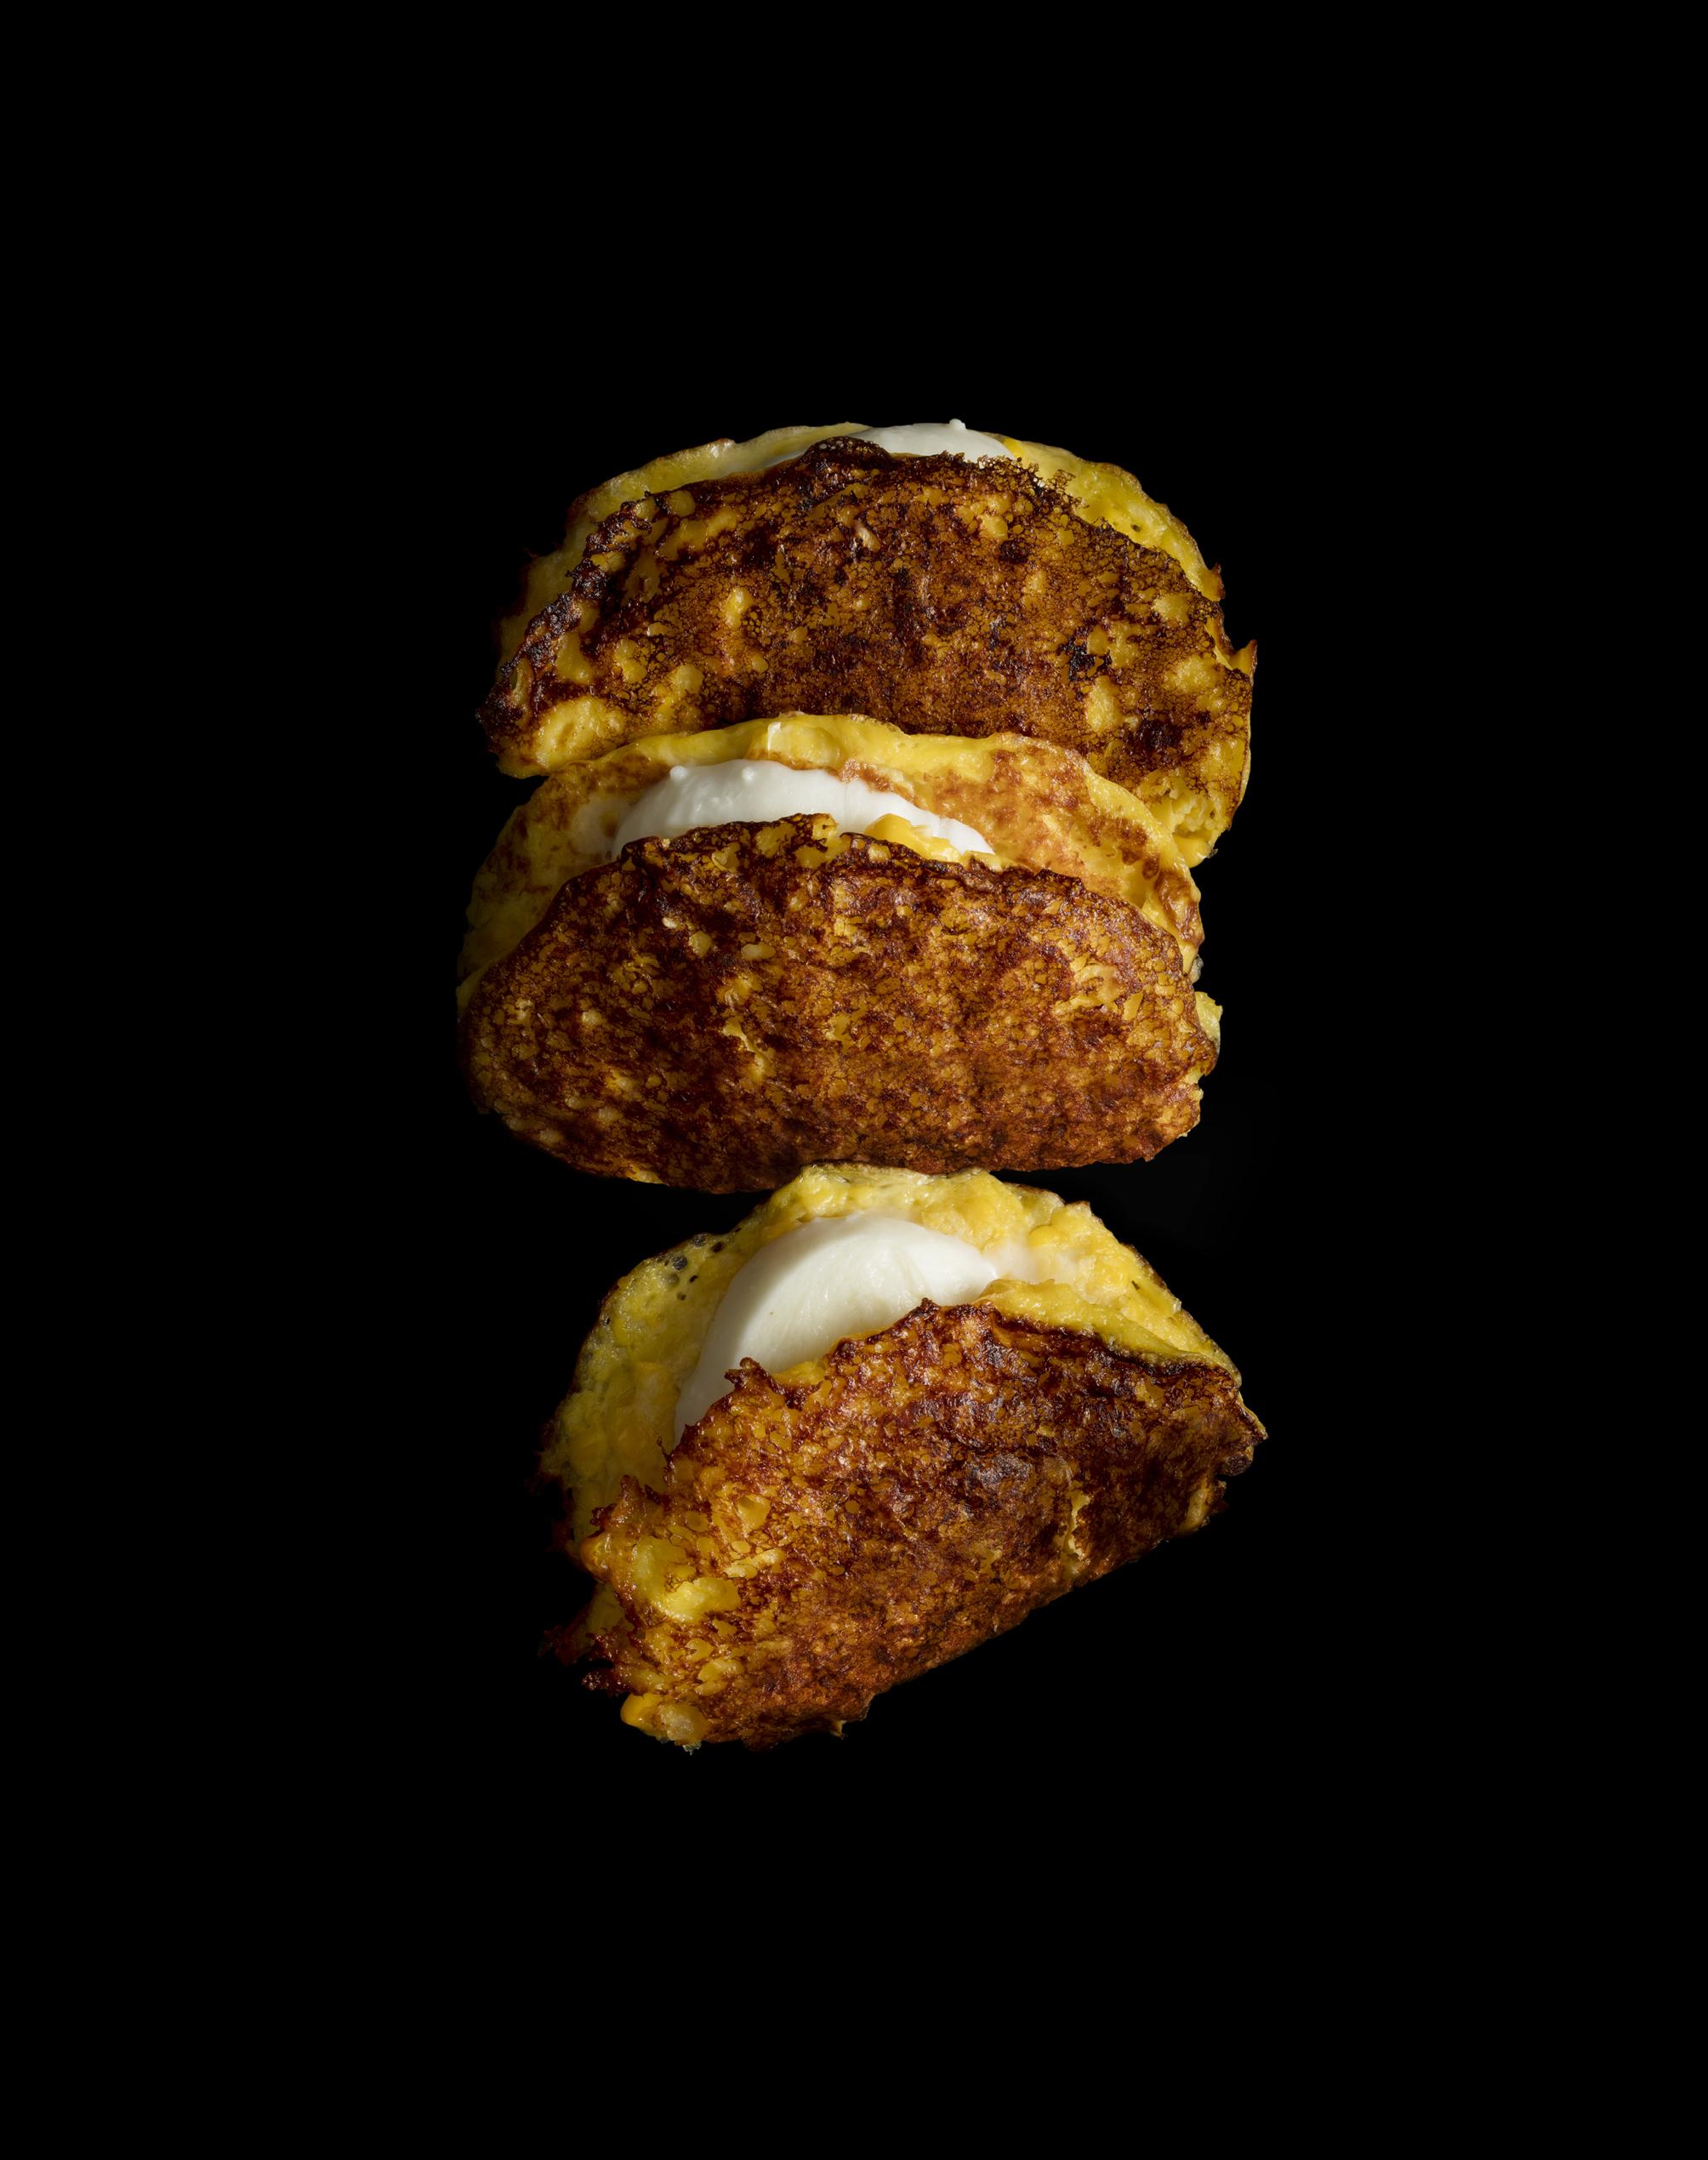 Sweetcorn Pancakes from The Recipe by Josh Emett, image copyright © Kieran E. Scott.jpg